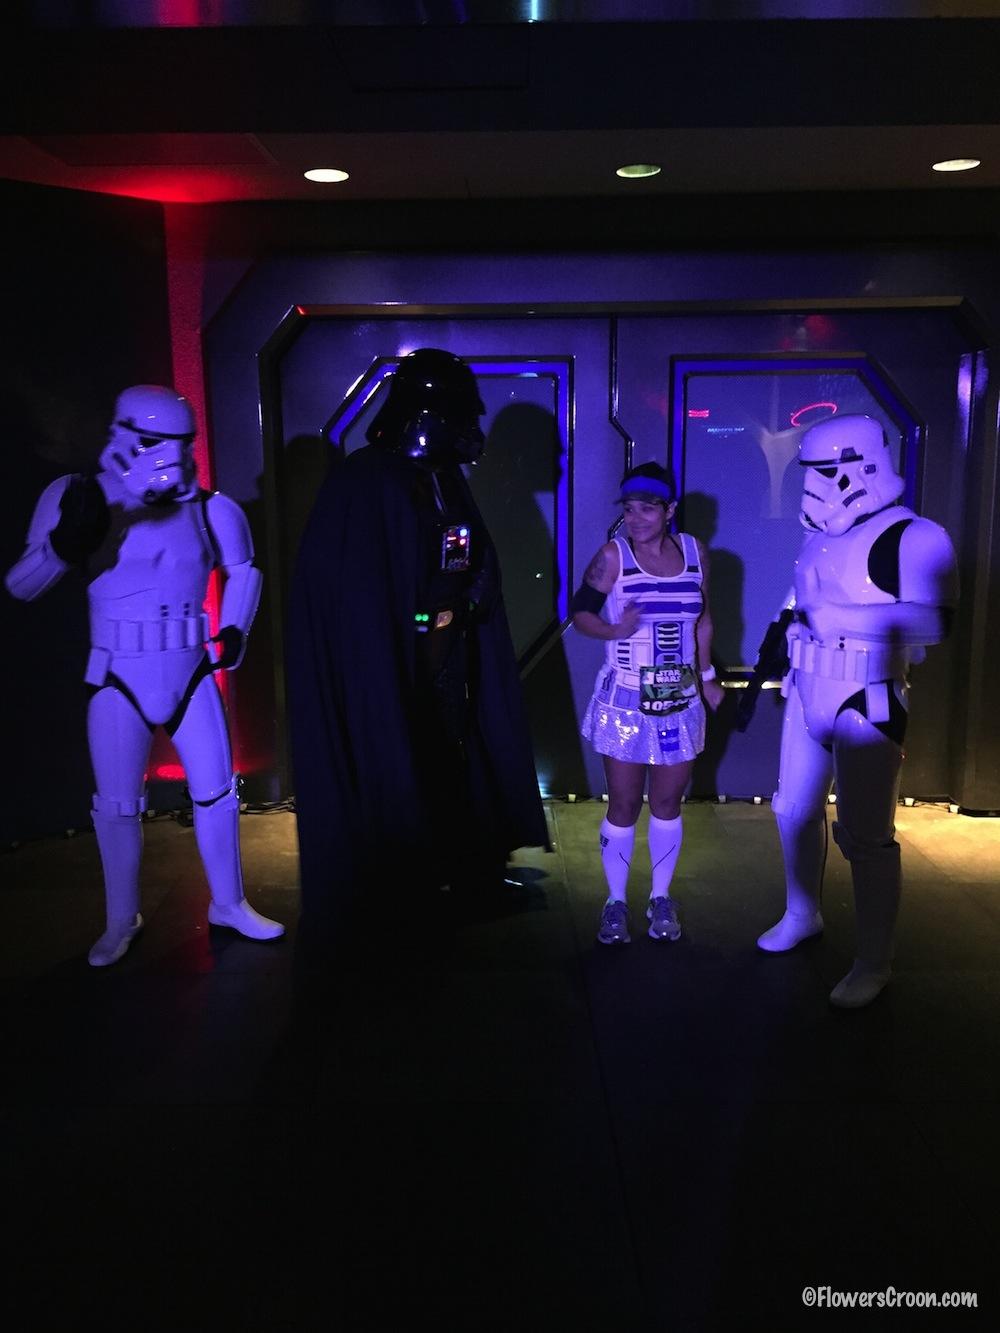 darth-vader-storm-troopers-star-wars-half.jpg